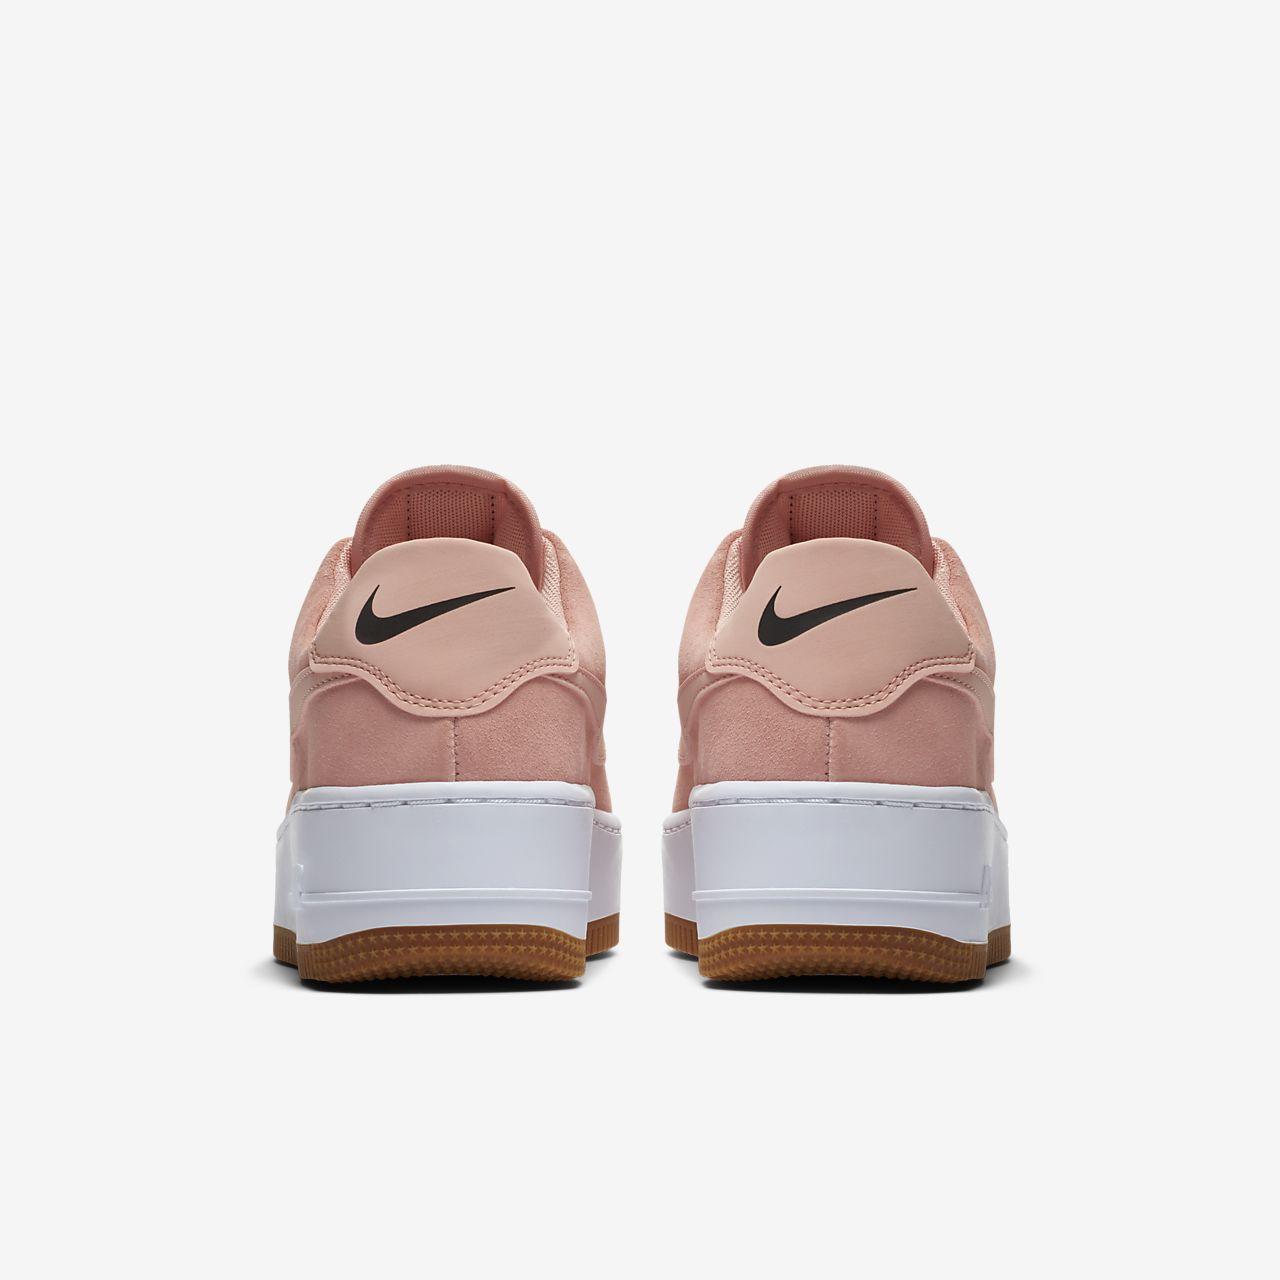 Tenis Nike Air Force 1 Sage Low piel rojo